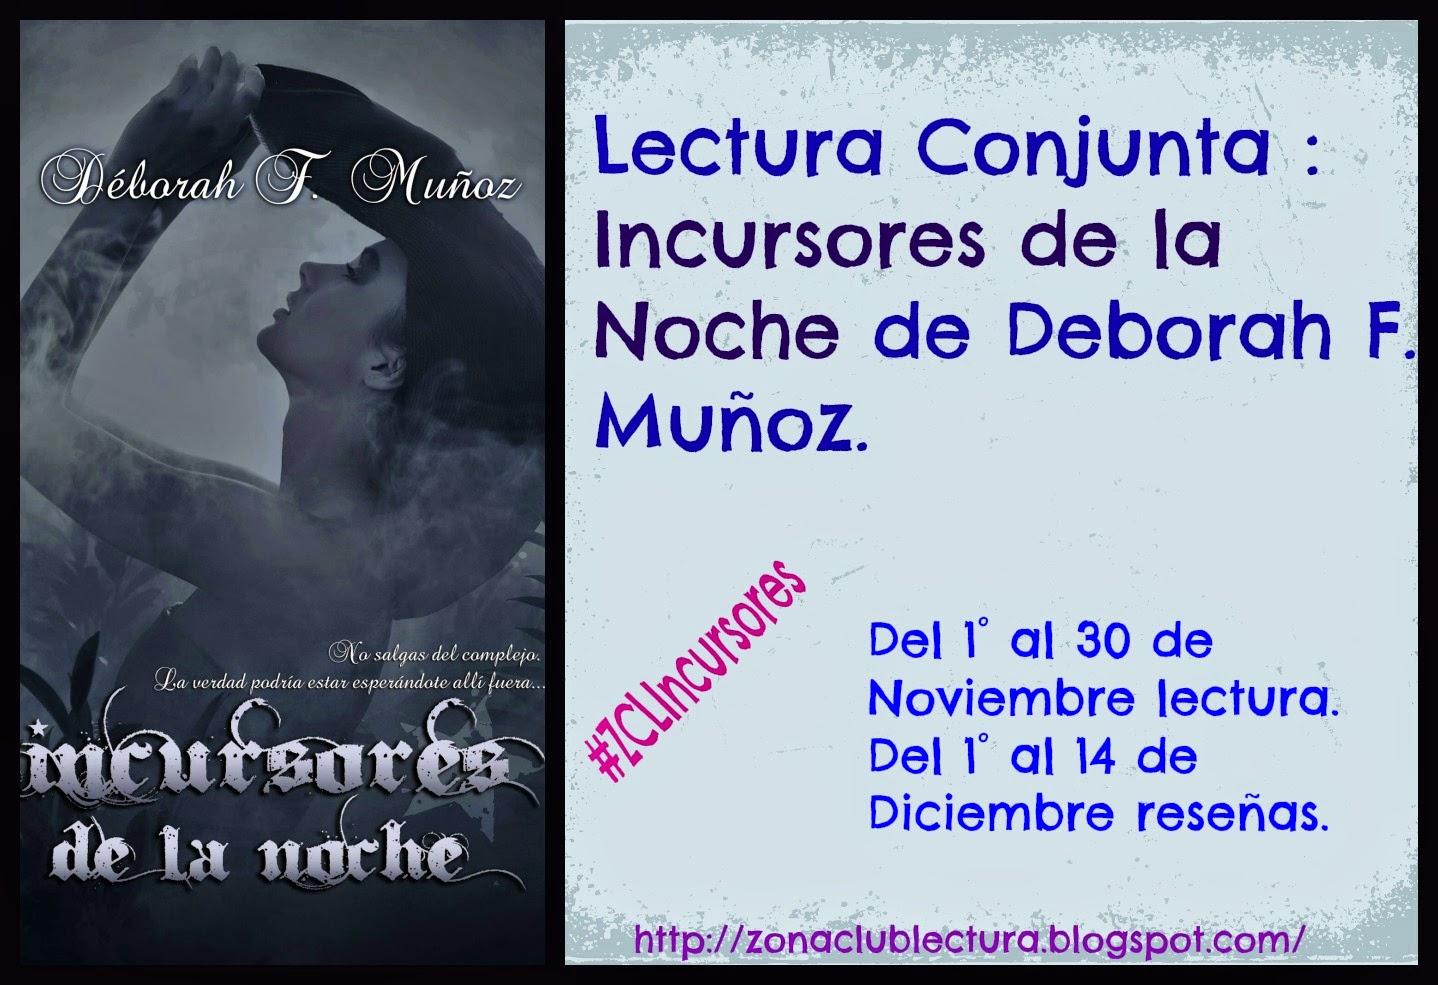 http://zonaclublectura.blogspot.com.es/2014/10/lectura-conjunta-2-incursores-de-la.html